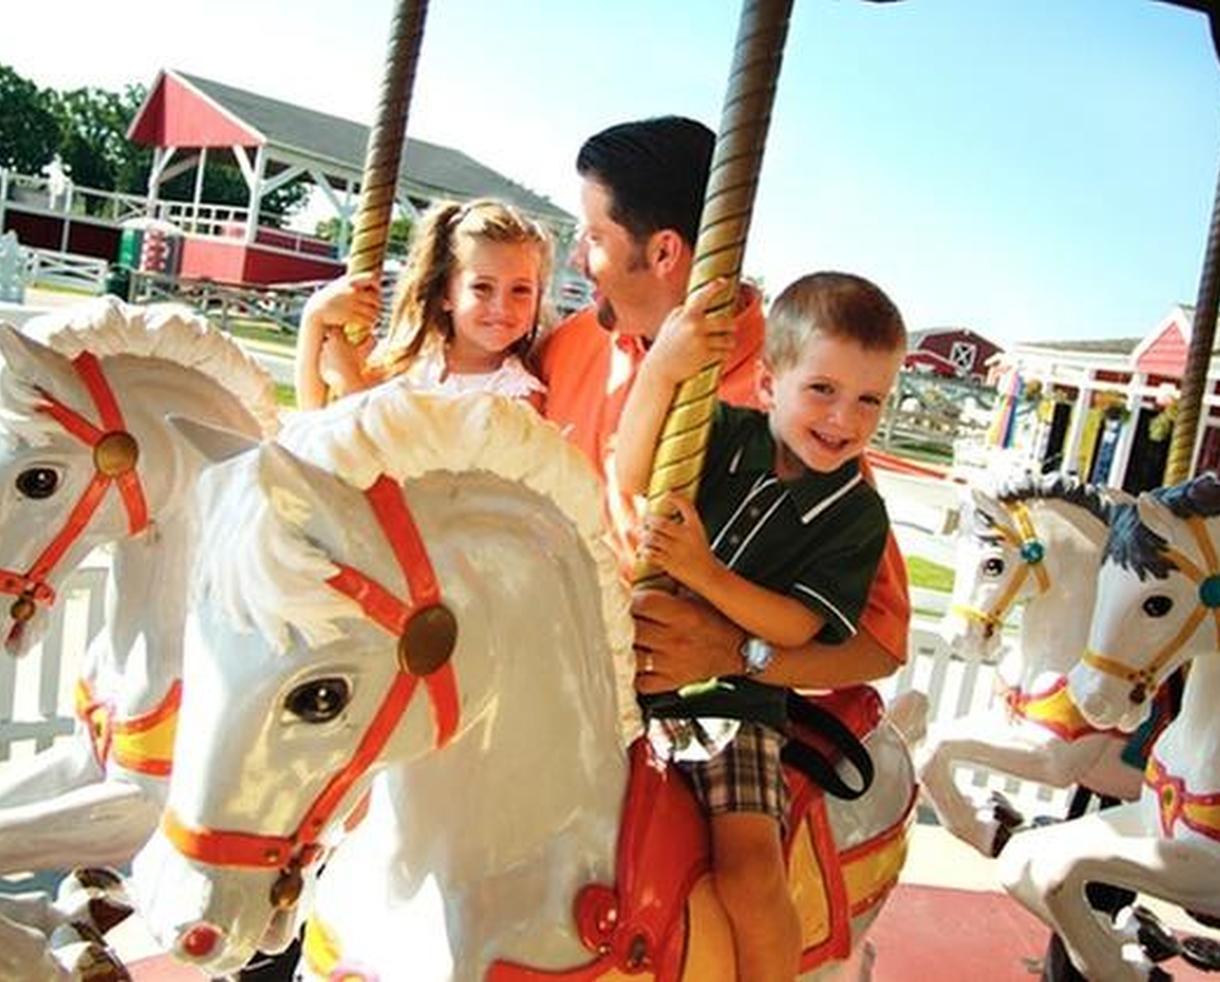 $11 Towards $20 of Farmyard and Attractions Experience at Lambs Farm